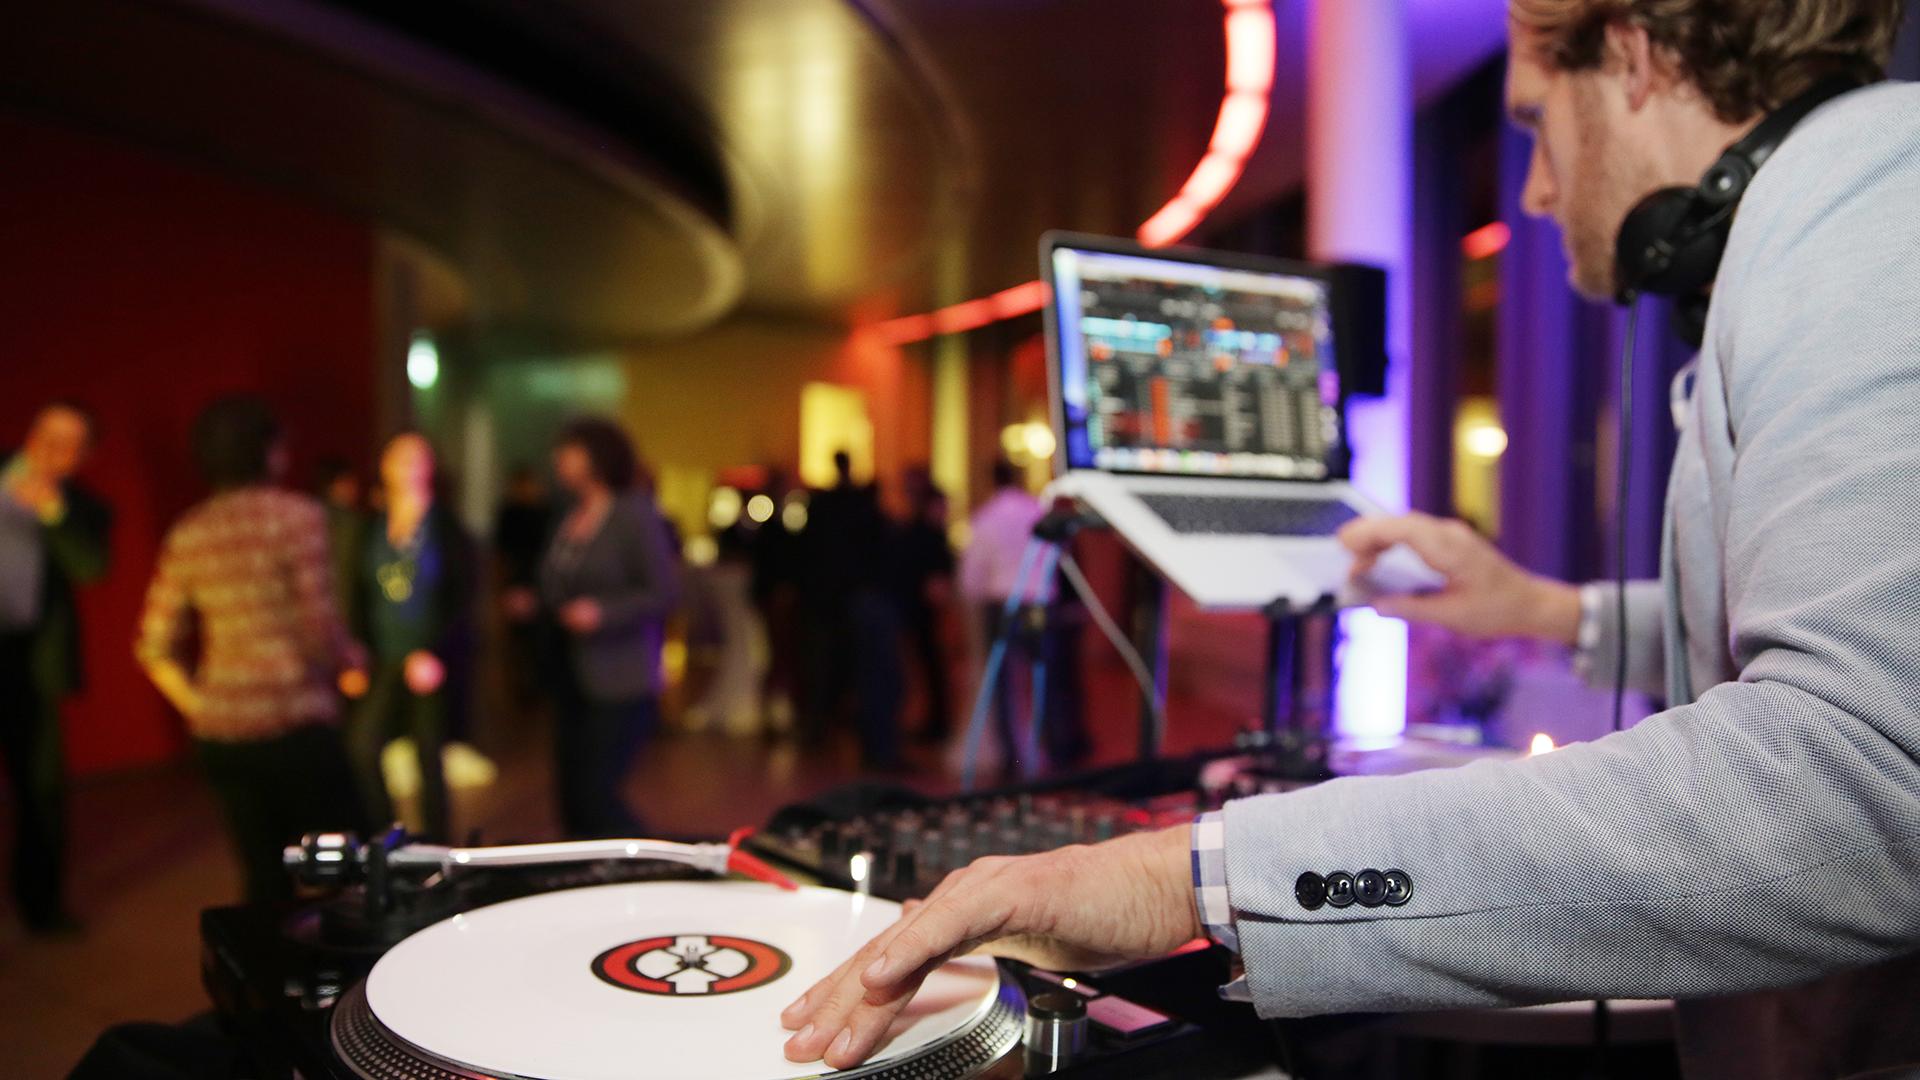 Event-DJ-Koelnsky-Koelnturm-Corporate-Party-Lounge-01